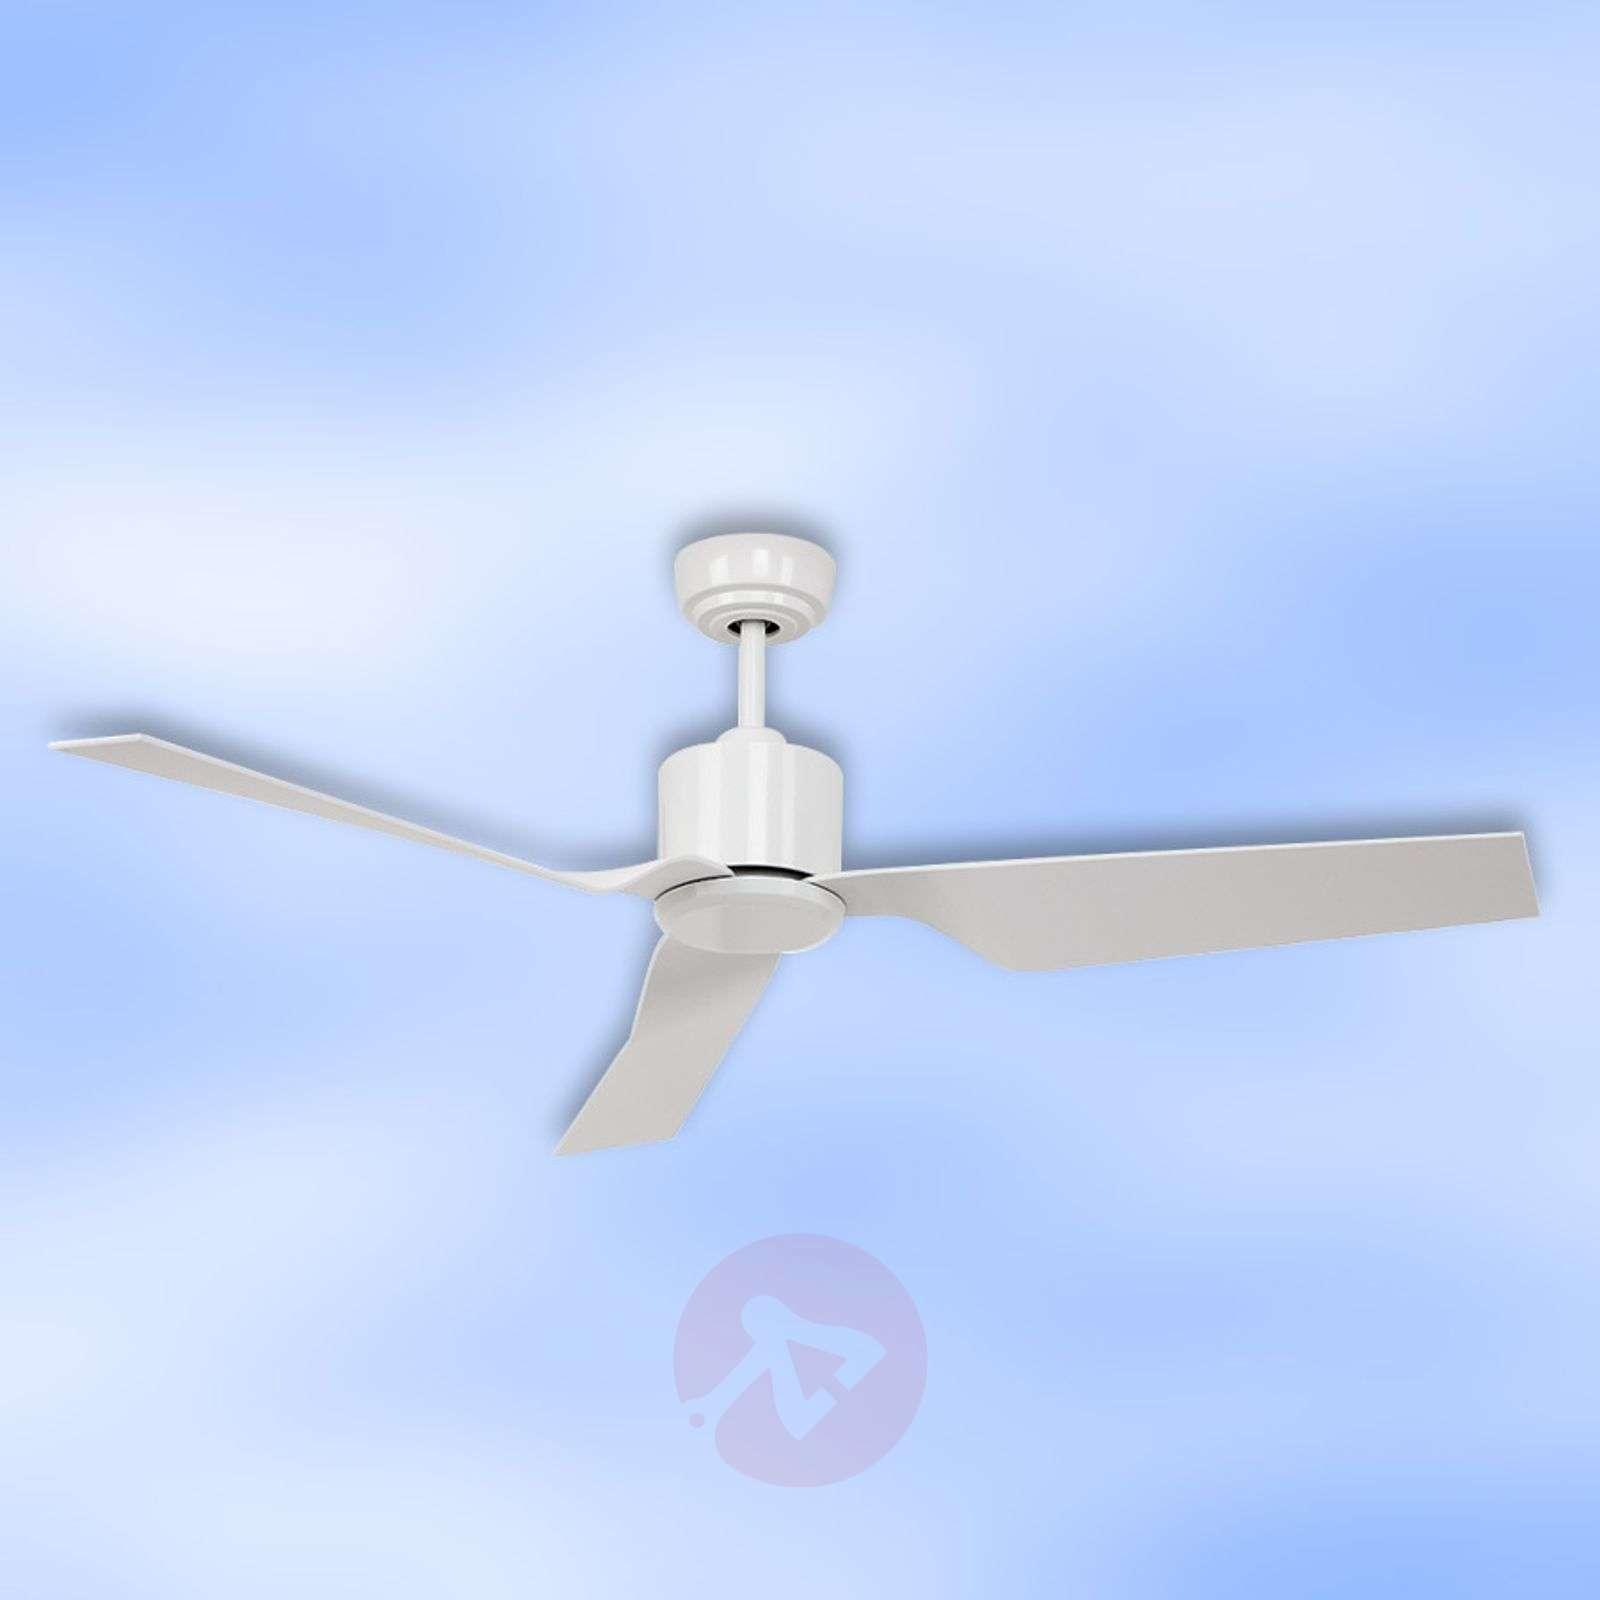 Eco Dynamix-kattotuuletin, valkoinen-2015066-01